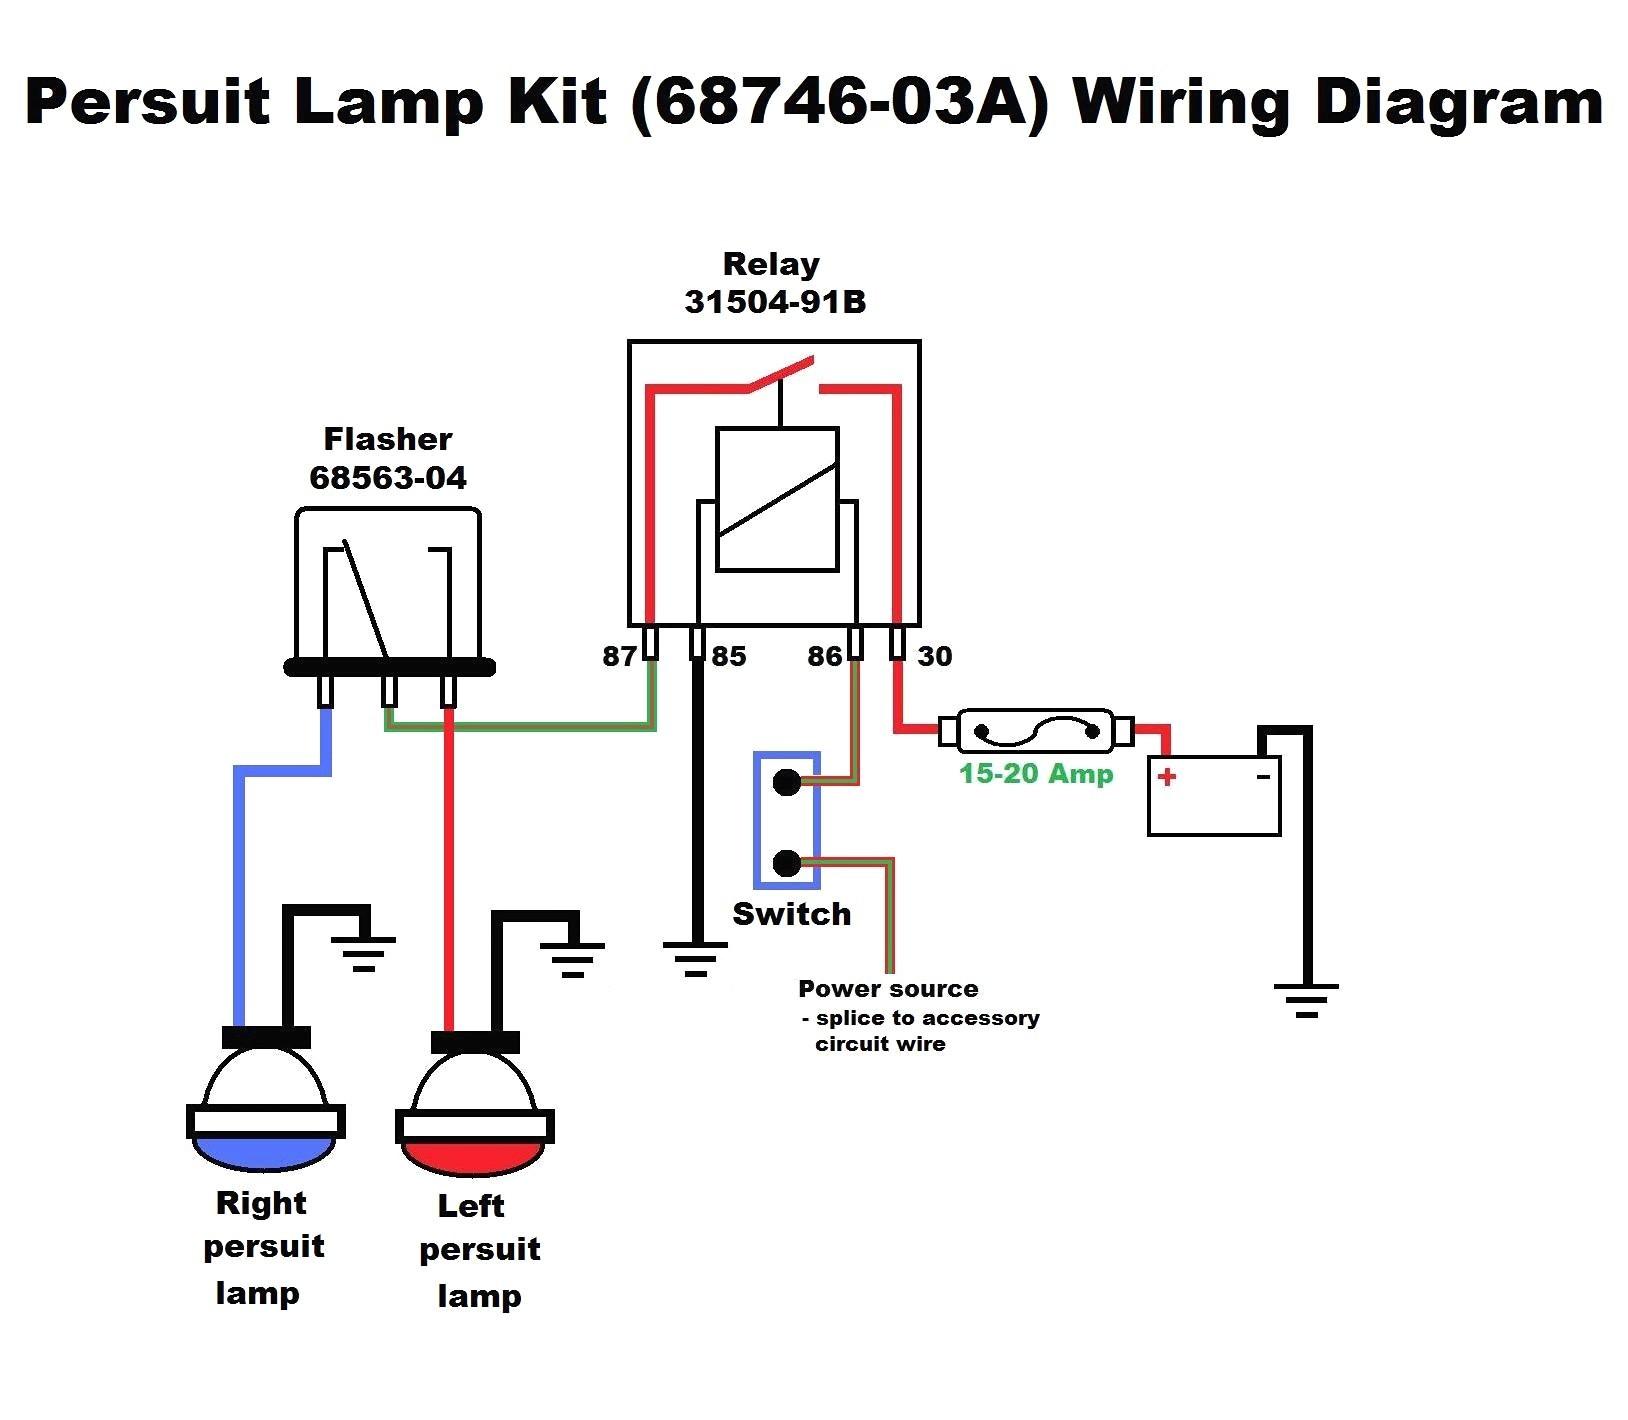 2 Pin Flasher Vs 3 Pin Flasher Grafik Empi Turn Signal Wiring Diagram Hd Quality Of 2 Pin Flasher Vs 3 Pin Flasher